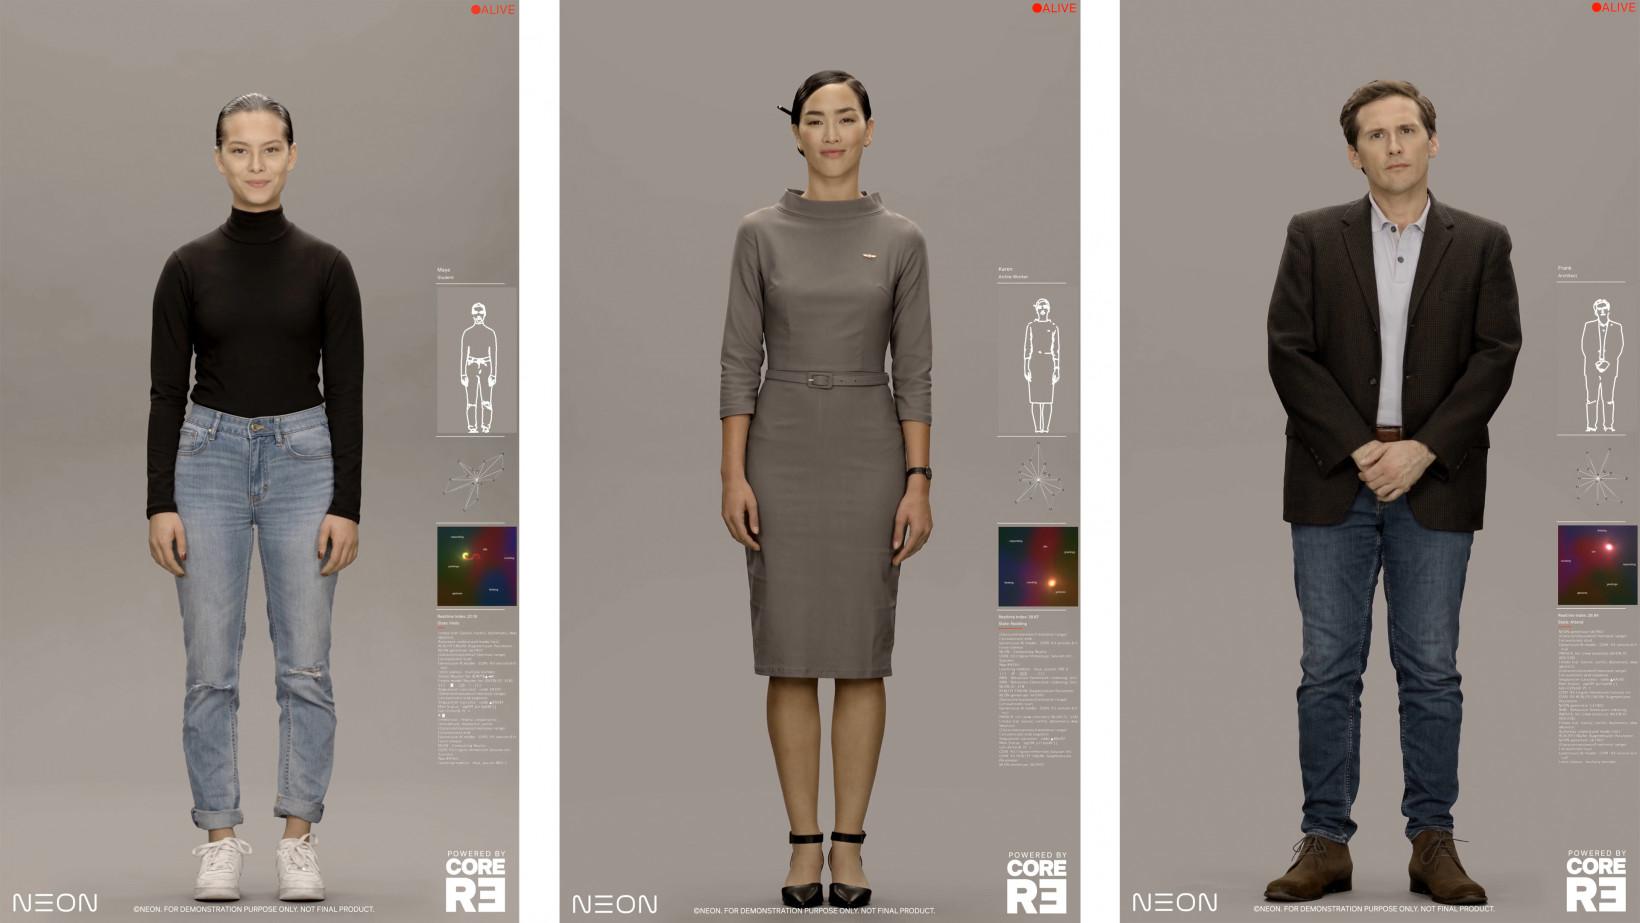 Samsung is working on lifelike AI-powered avatars to fill in for humans三星Neon项目首亮相:有情感、有记忆、会学习